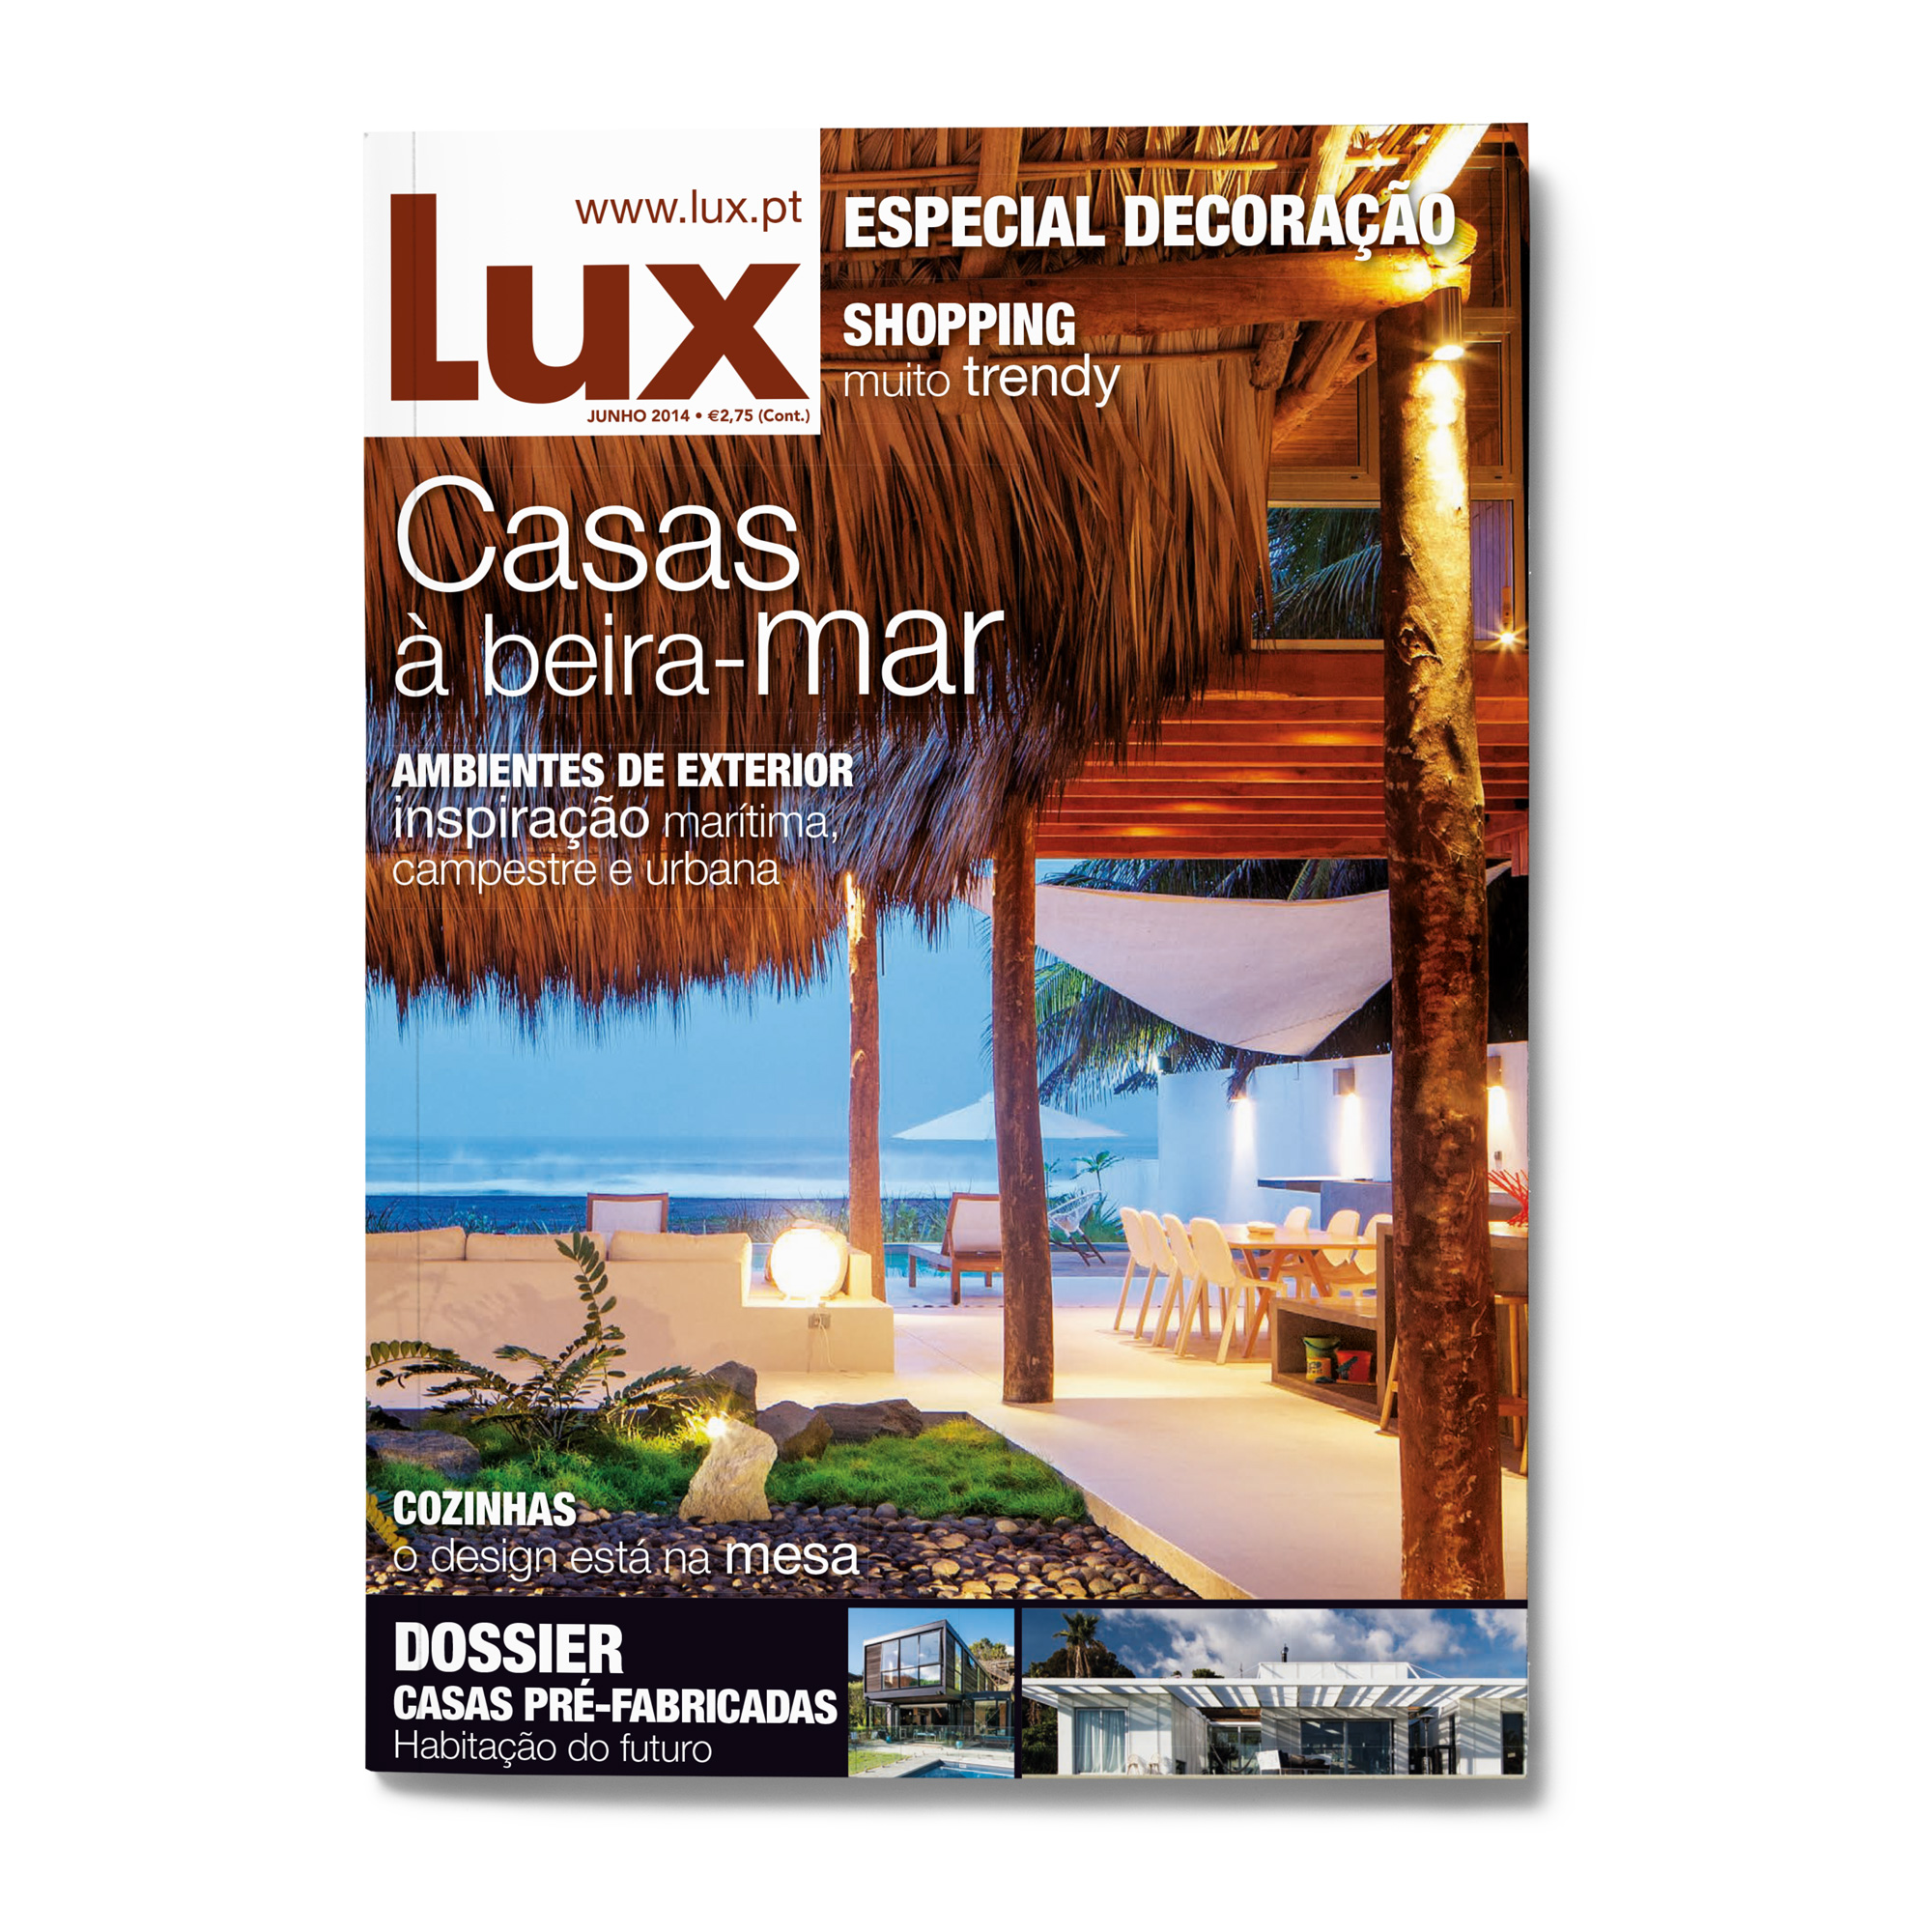 Lux Front Page casas - DESIGN BY MIGUEL SOEIRO